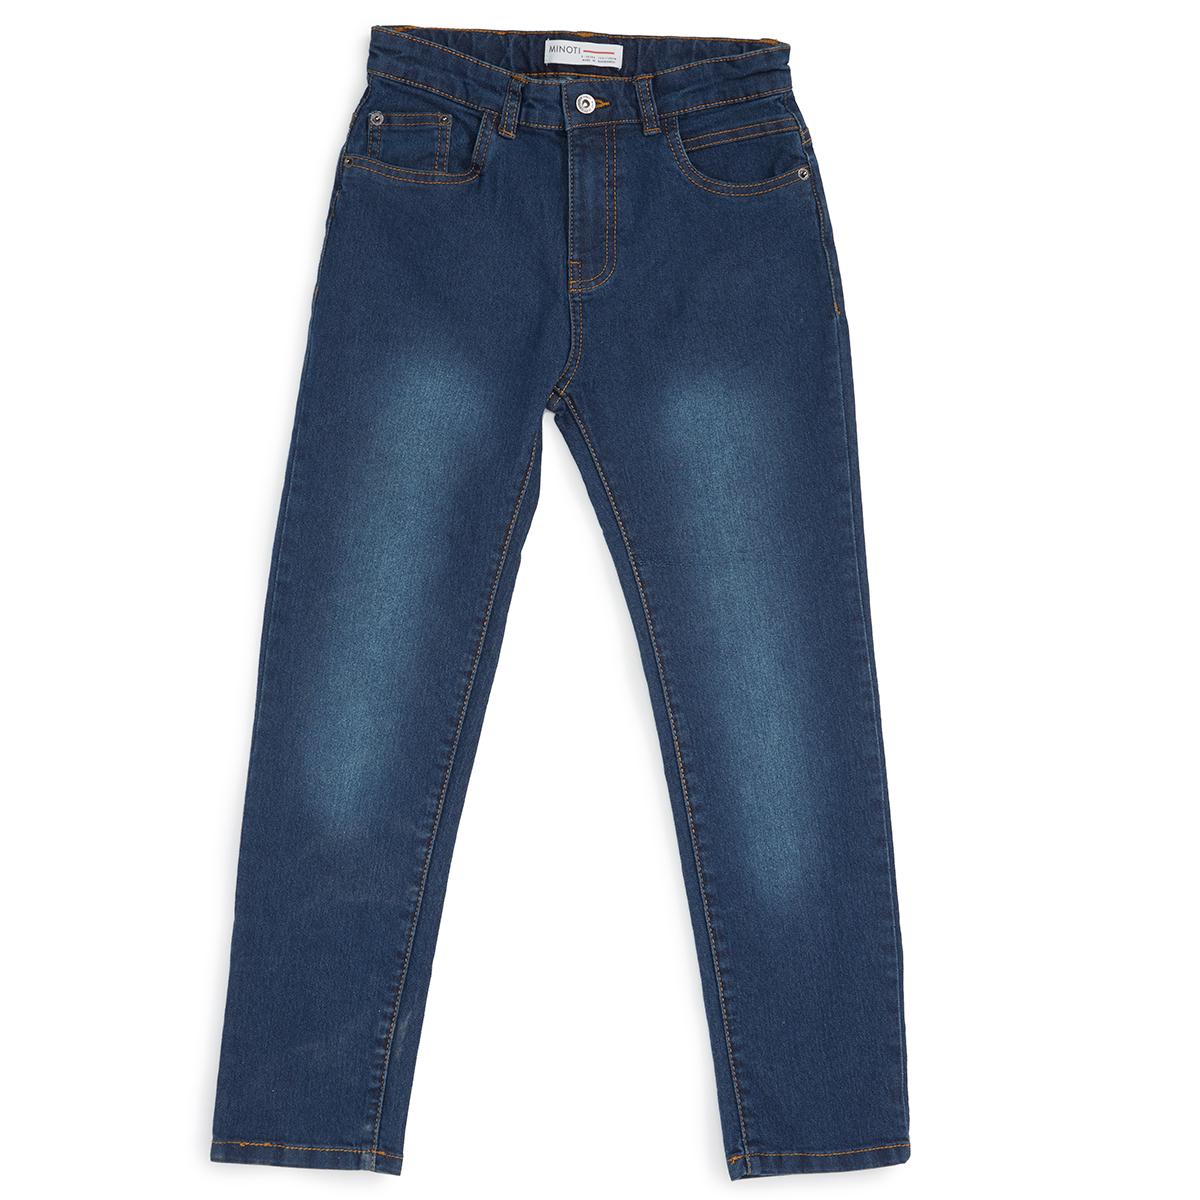 Minoti Big Boys' Regular Denim Jeans - Blue, 8-9